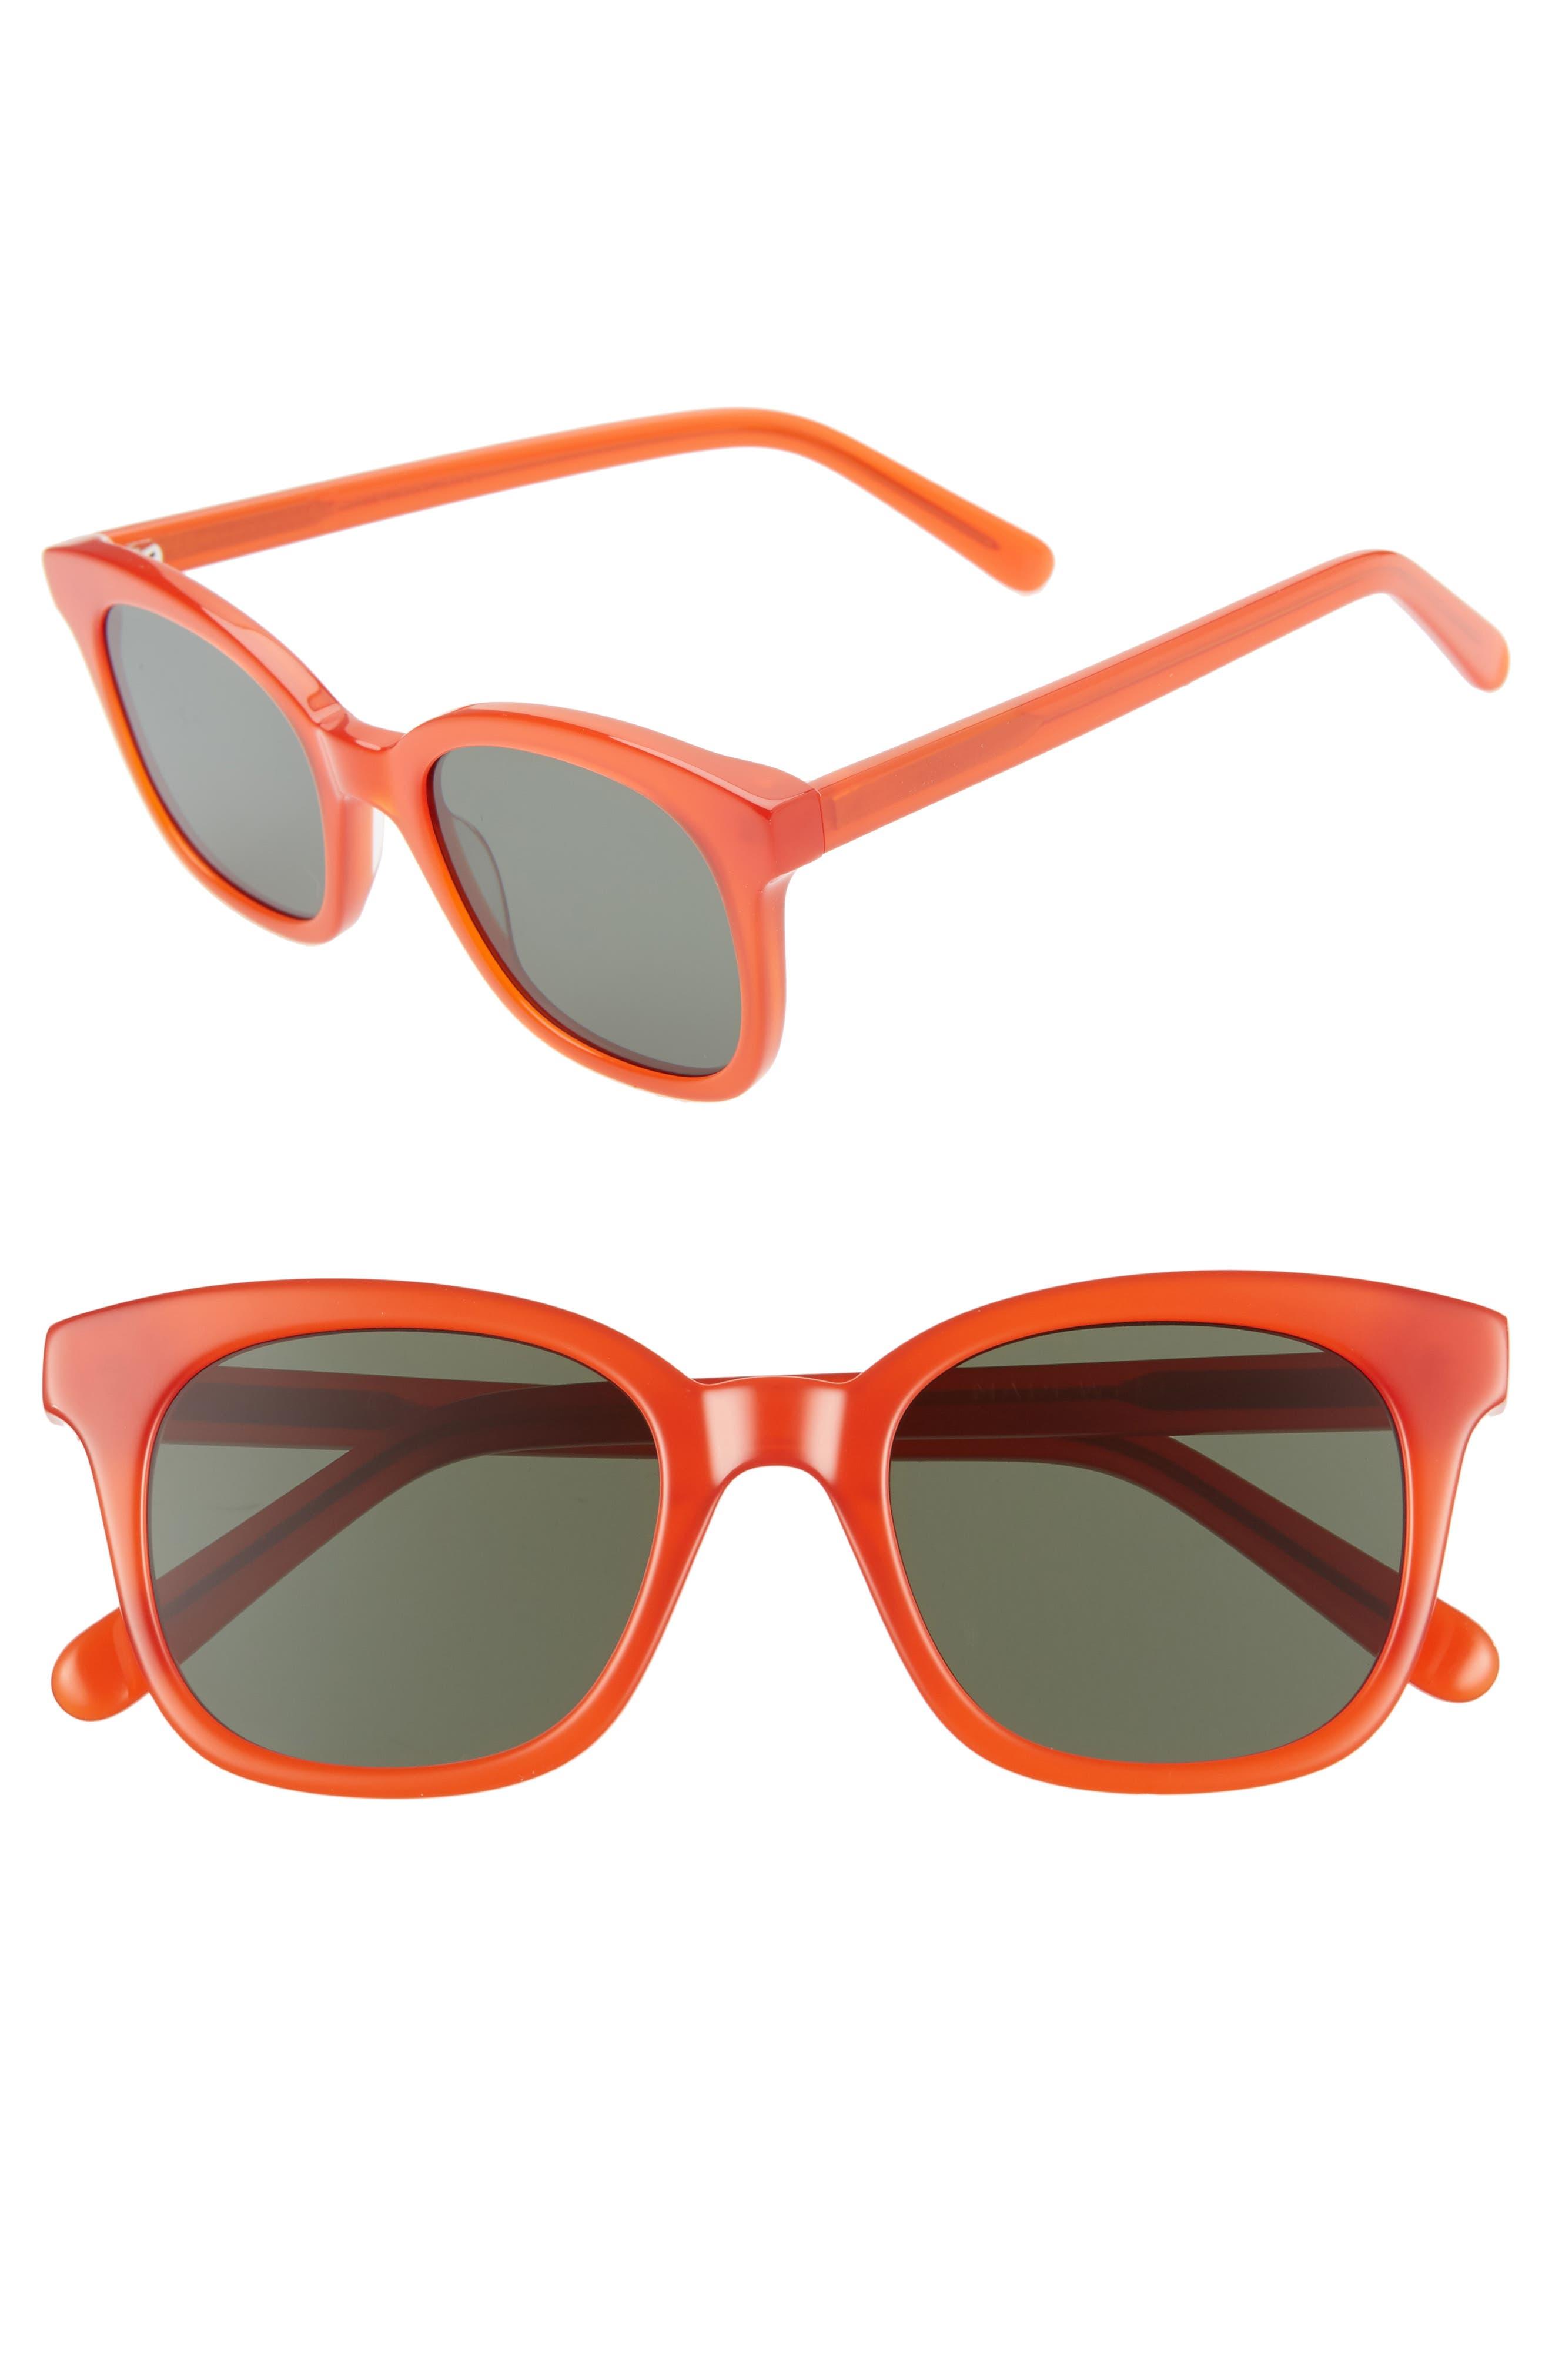 Madewell Venice 4m Flat Frame Sunglasses - American Red Multi